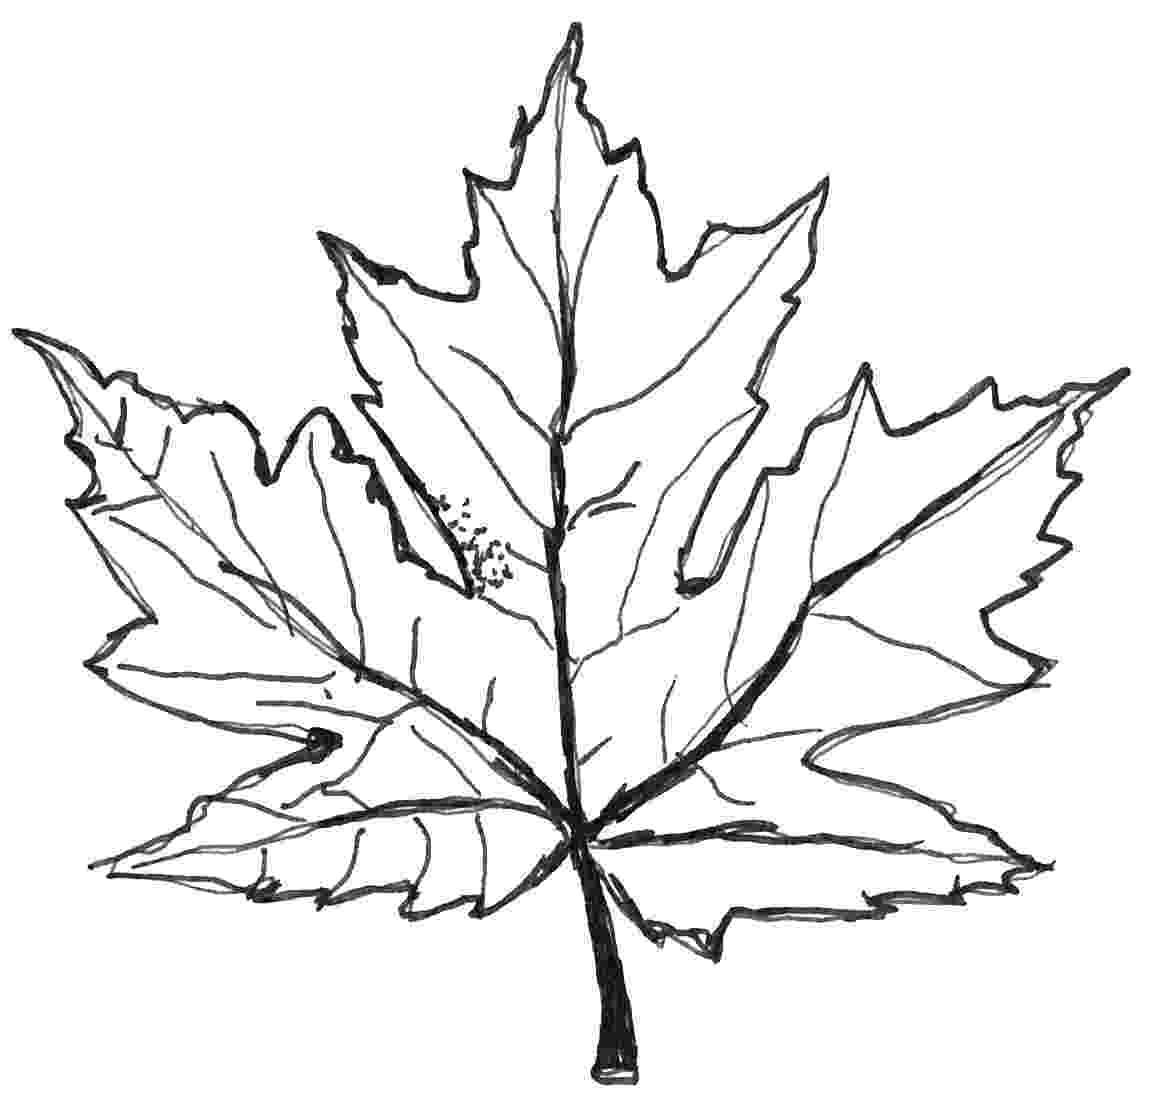 maple tree coloring page maple tree coloring pages for kids free printable maple tree coloring page maple